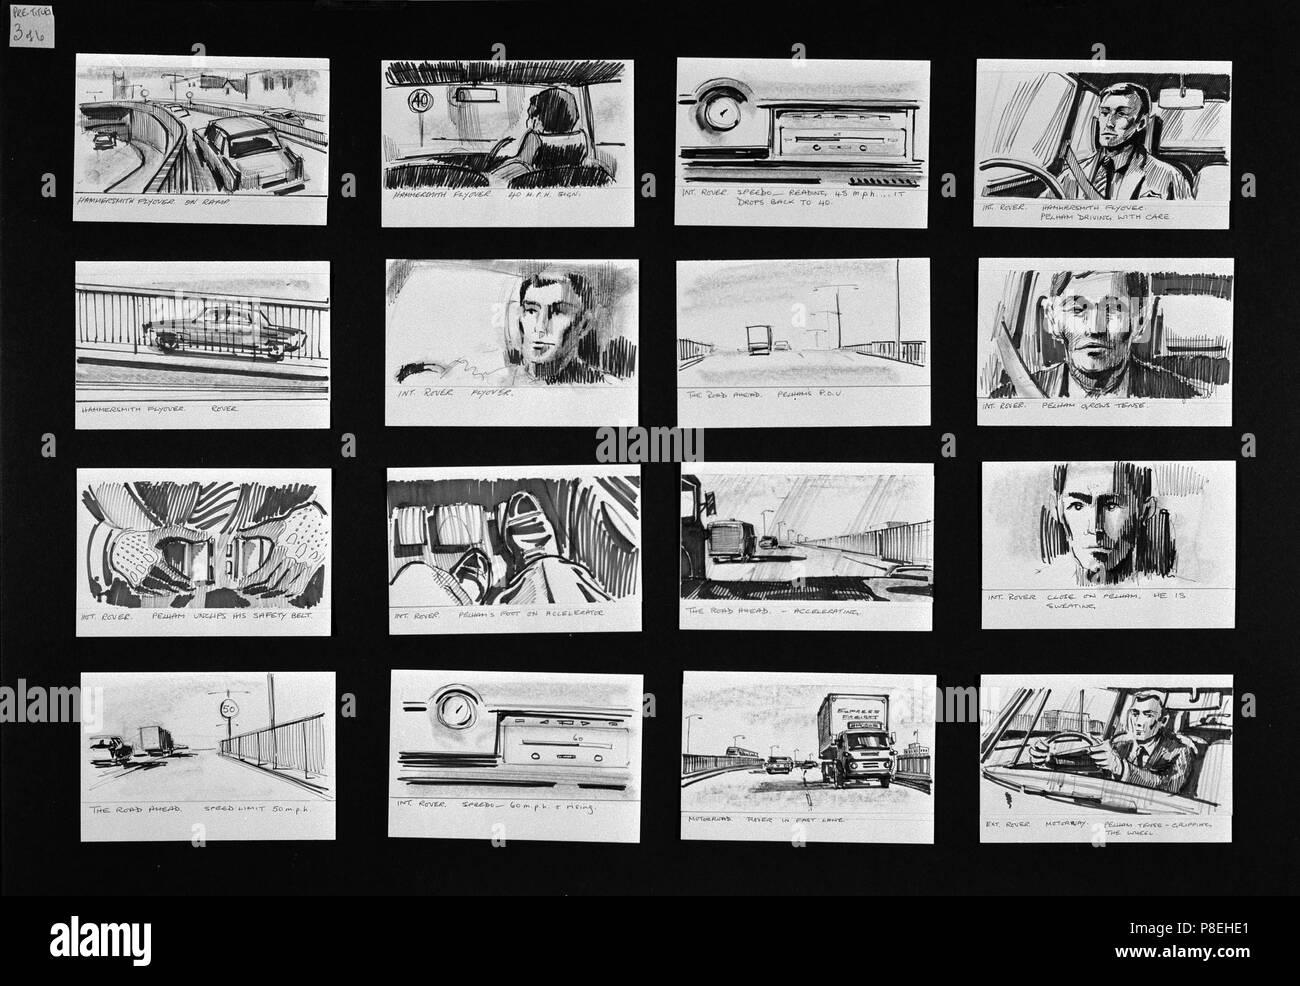 Storyboard Stock Photos & Storyboard Stock Images - Alamy